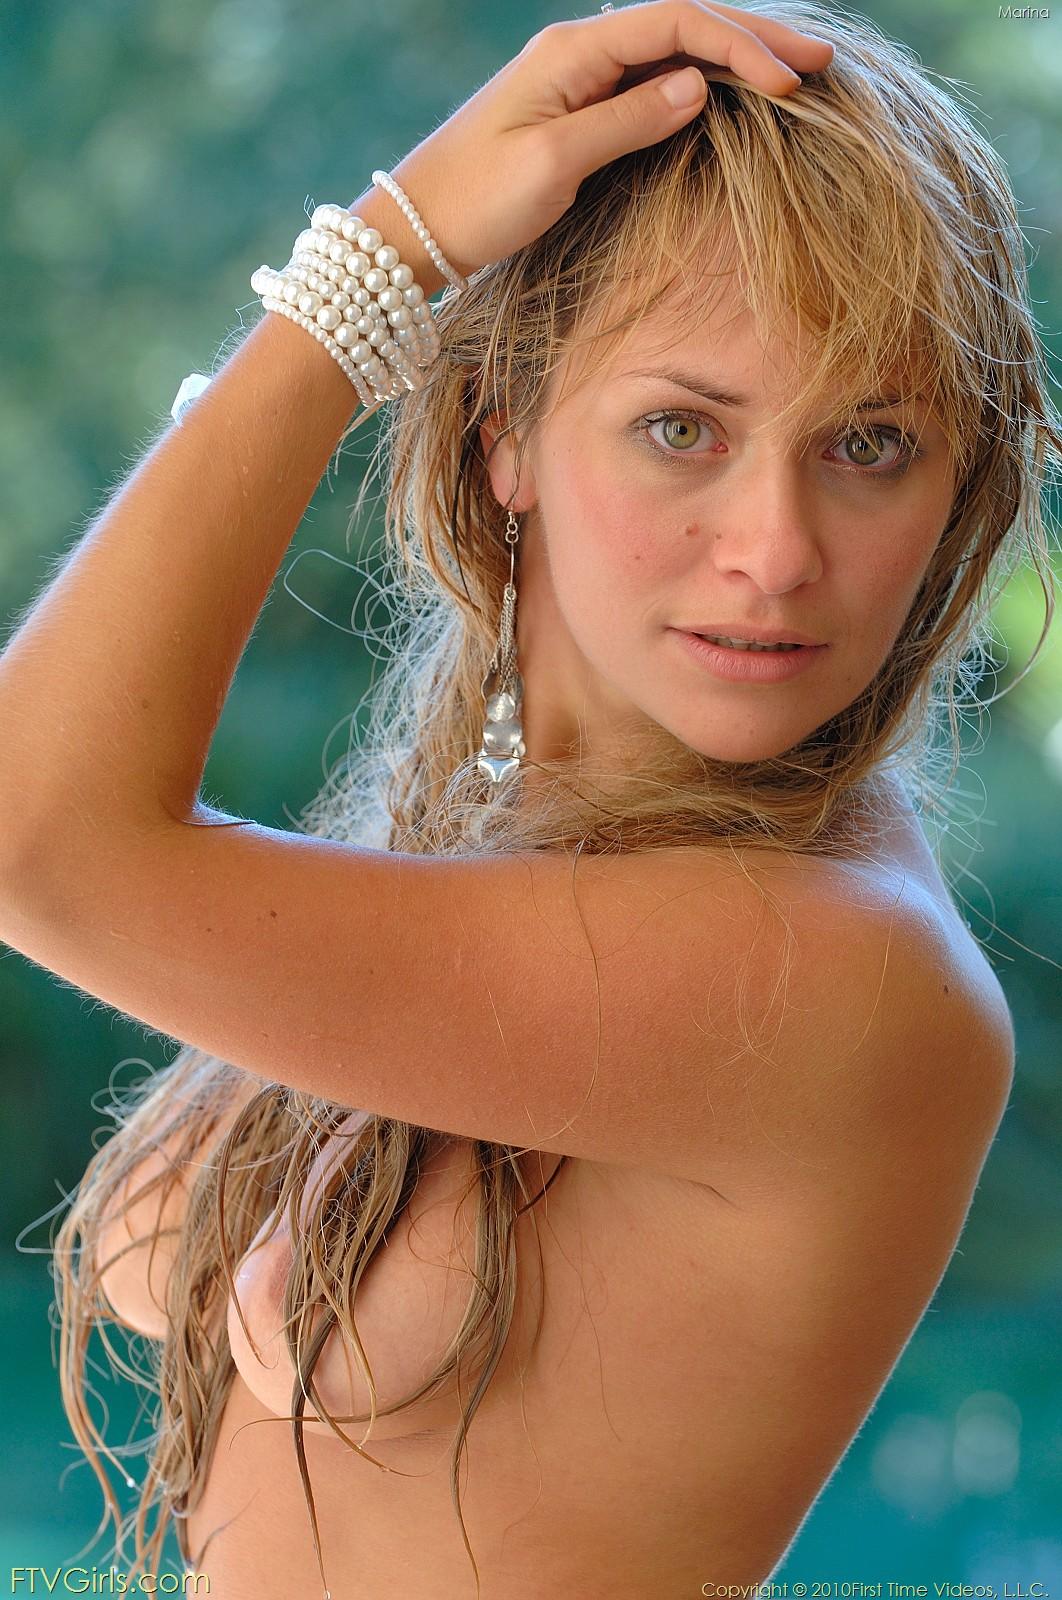 wpid-marina-shows-off-her-sweet-tits7.jpg